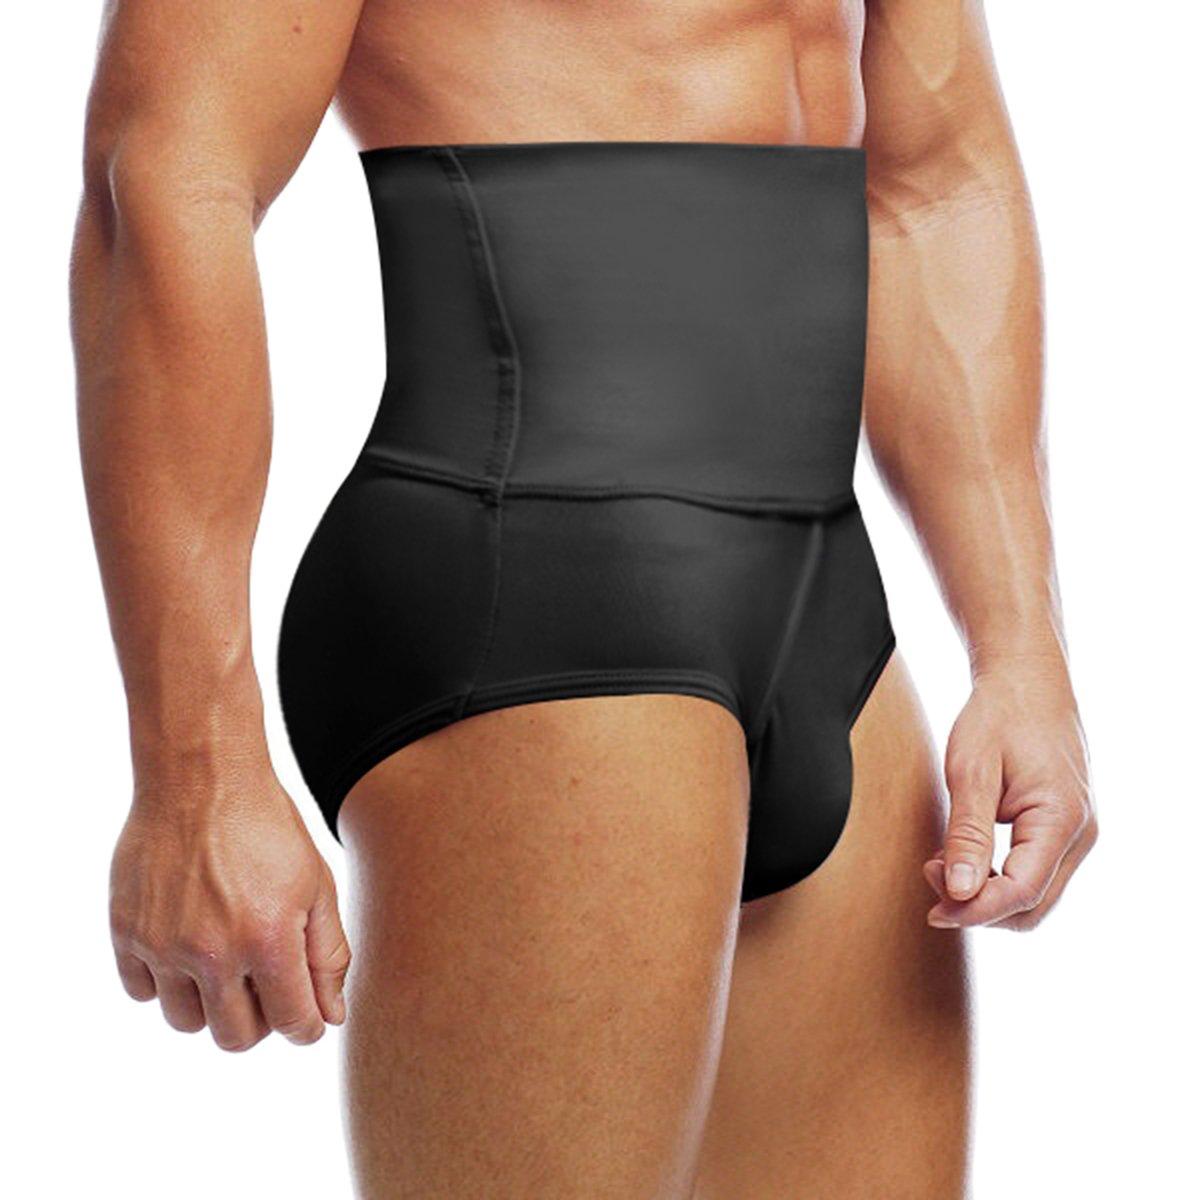 Haseil Men's Slimming Body Shaper High waist Abdomen Tummy Control Shaping Brief, Black, TagsizeL=USsizeM